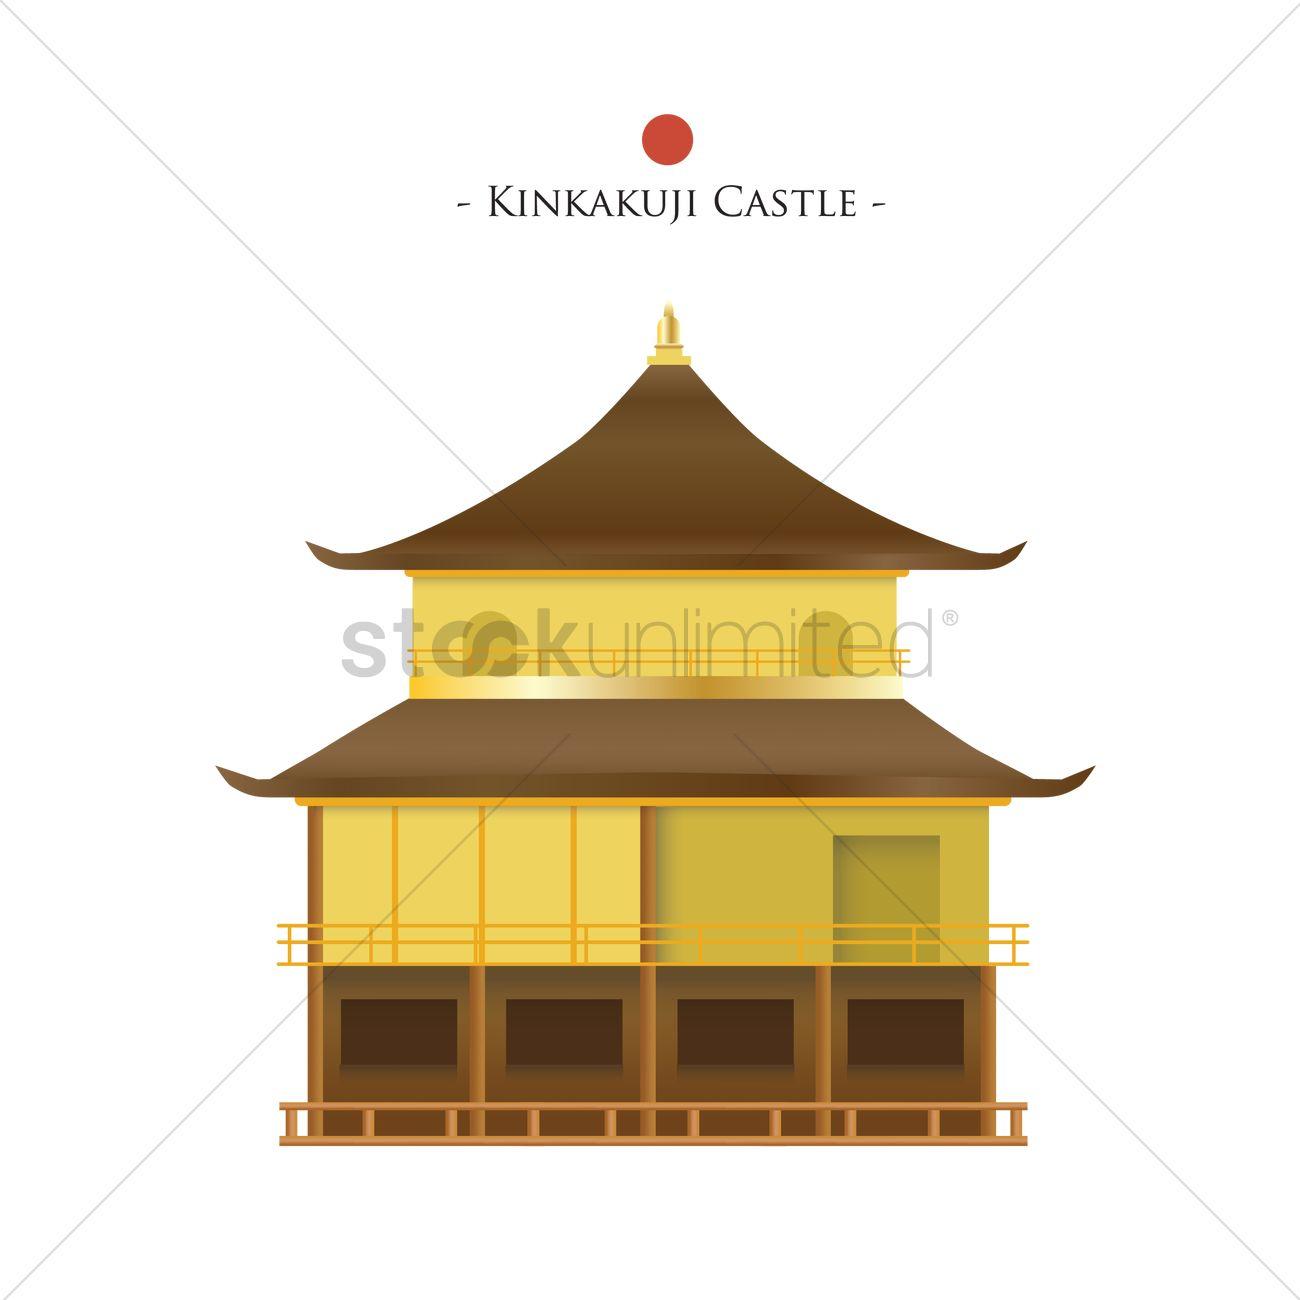 Kinkakuji castle Vector Image.